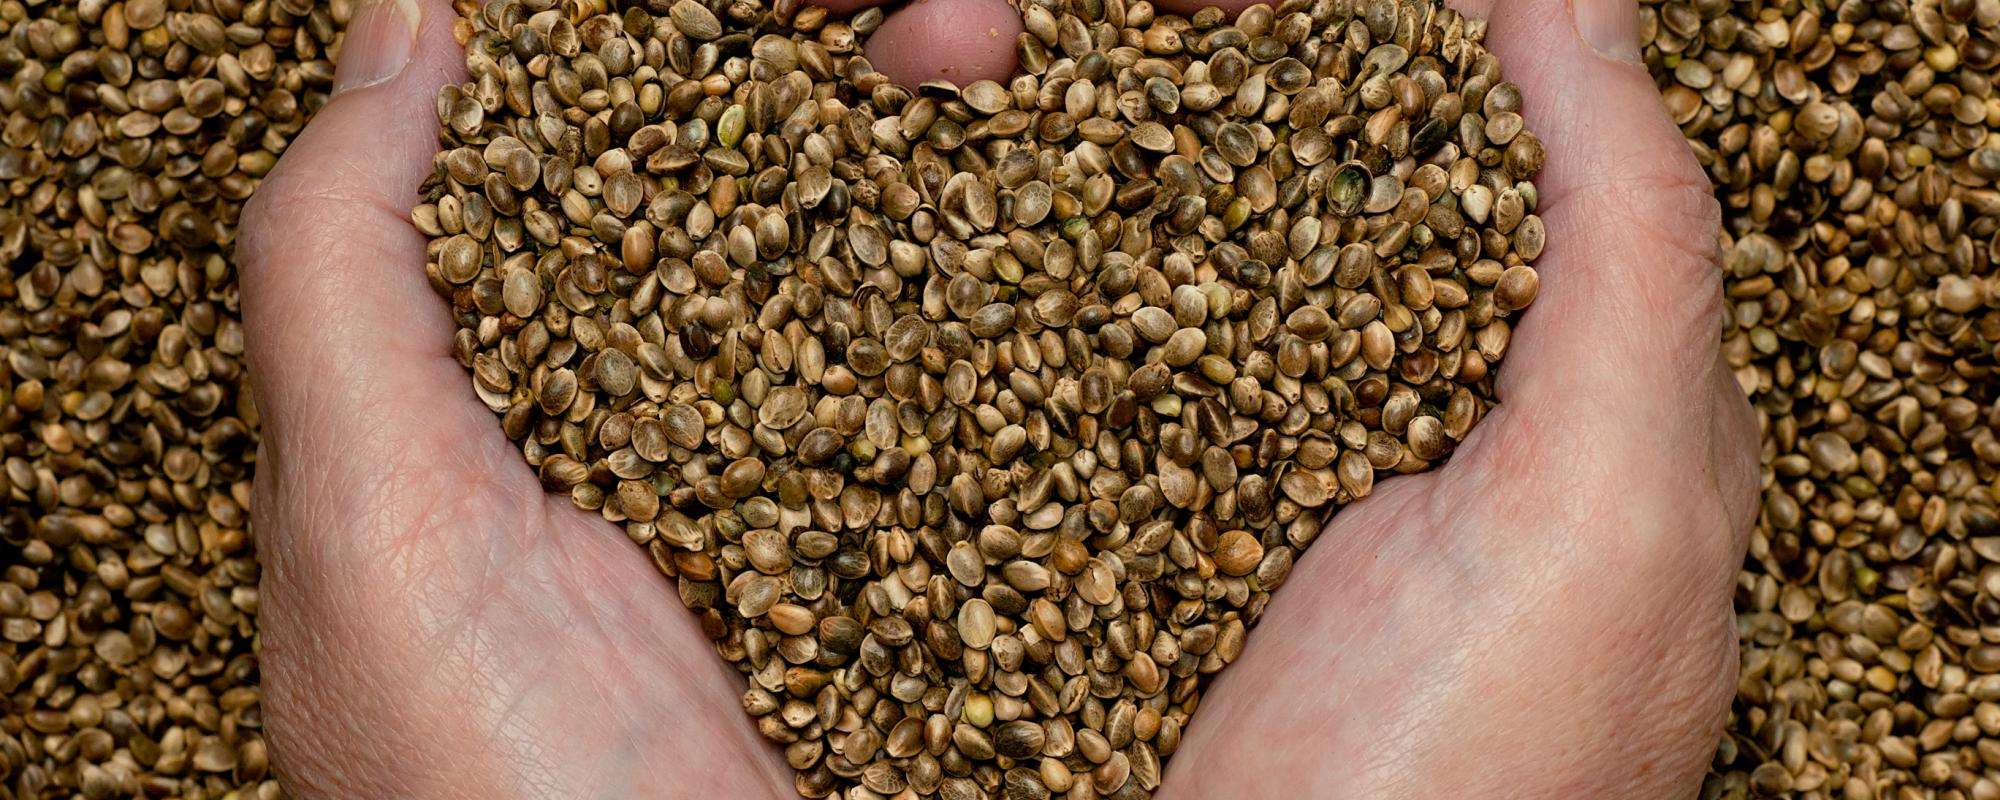 hands scooping up seeds